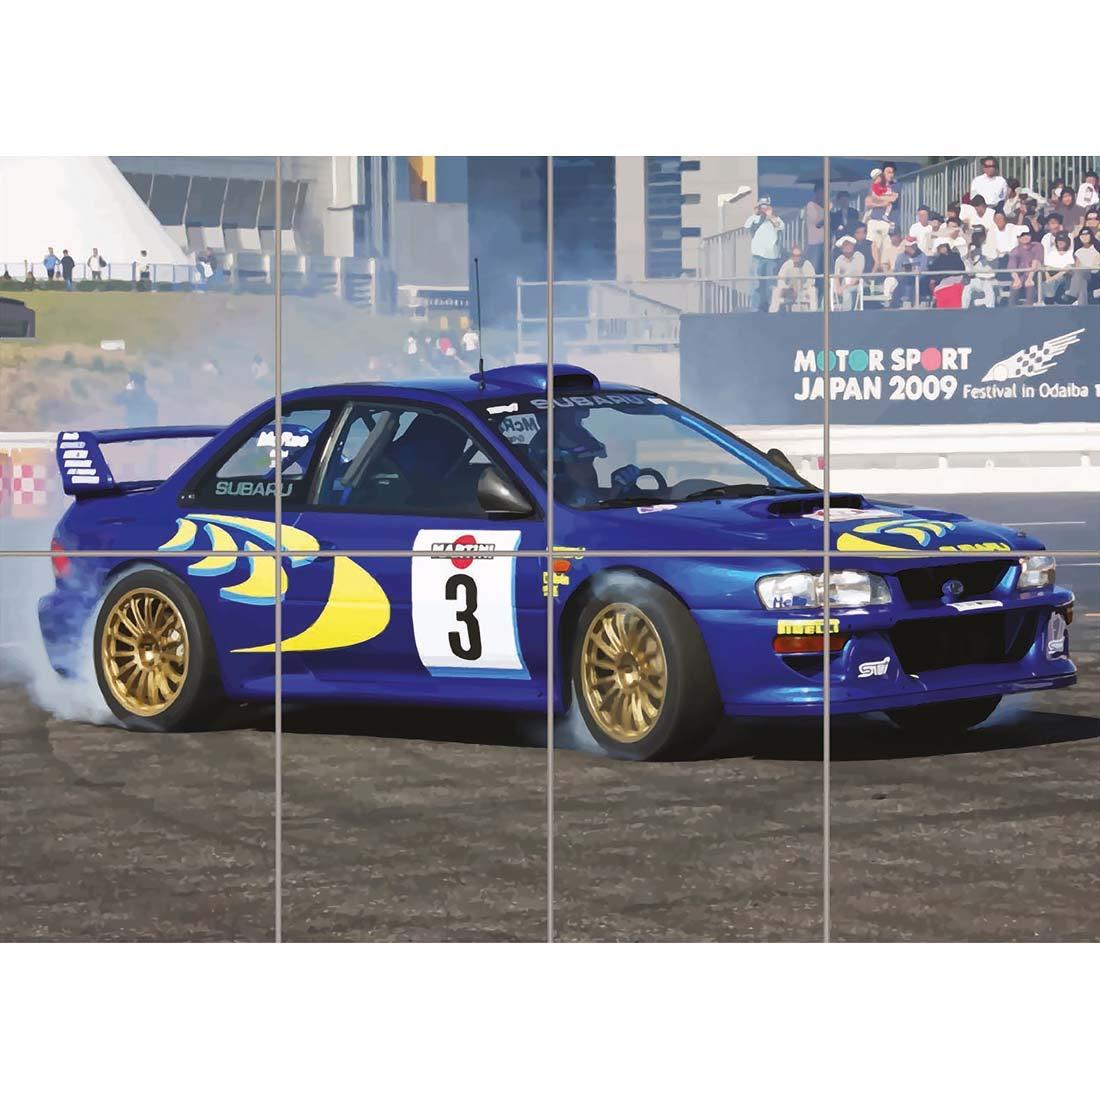 Doppelganger33 LTD Subaru Impreza WRC Colin McRae Rally CAR Giant Art Print Picture Poster ST946